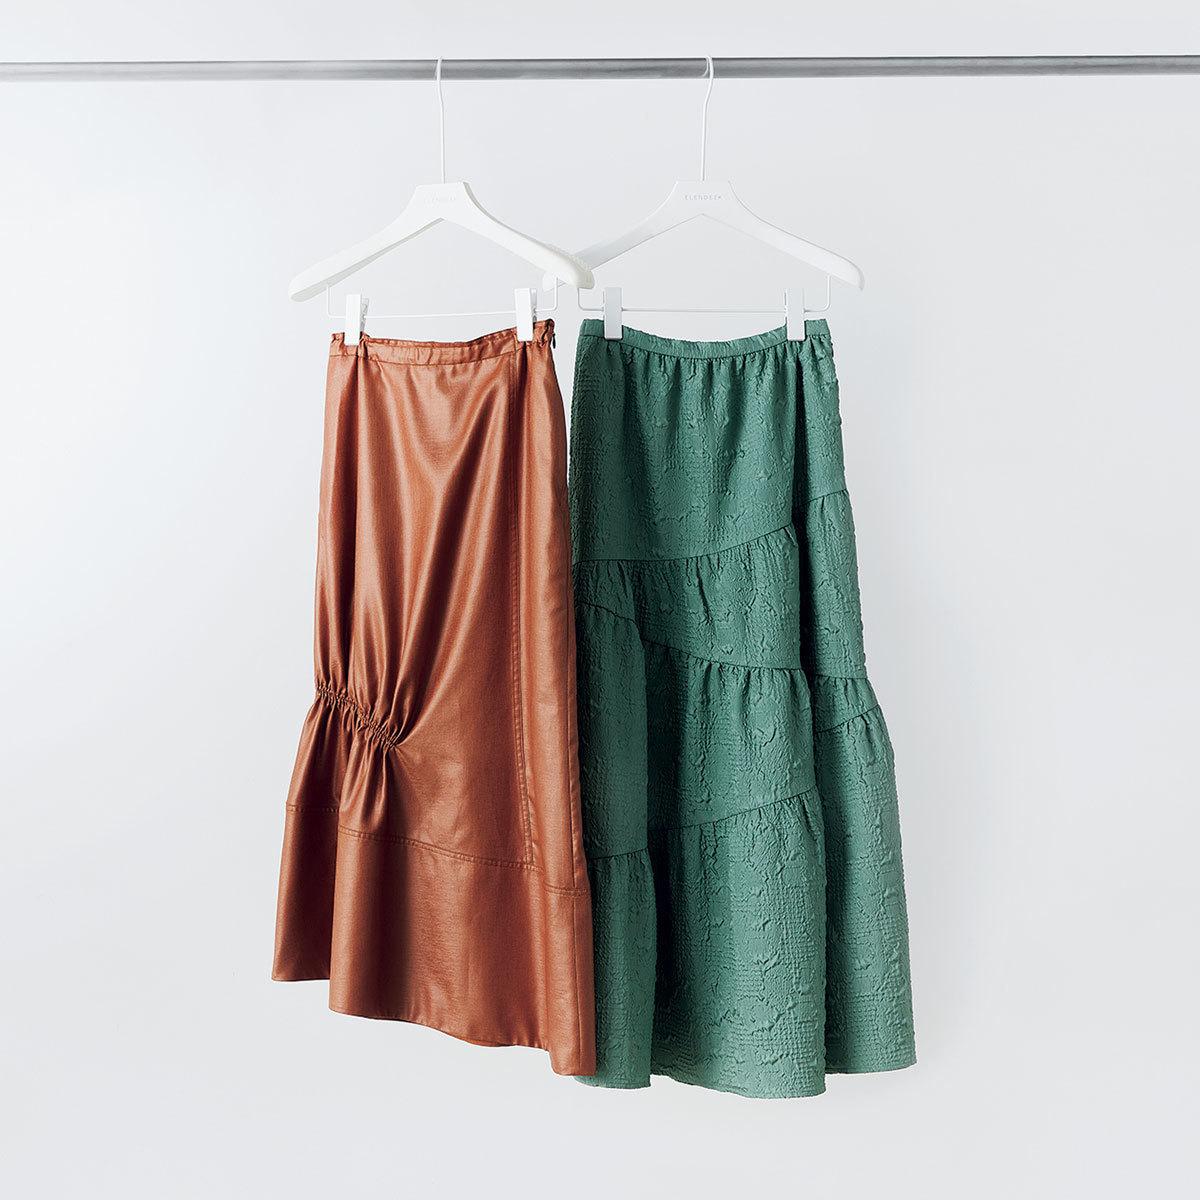 #02 ELENDEEK 華やぎスカート